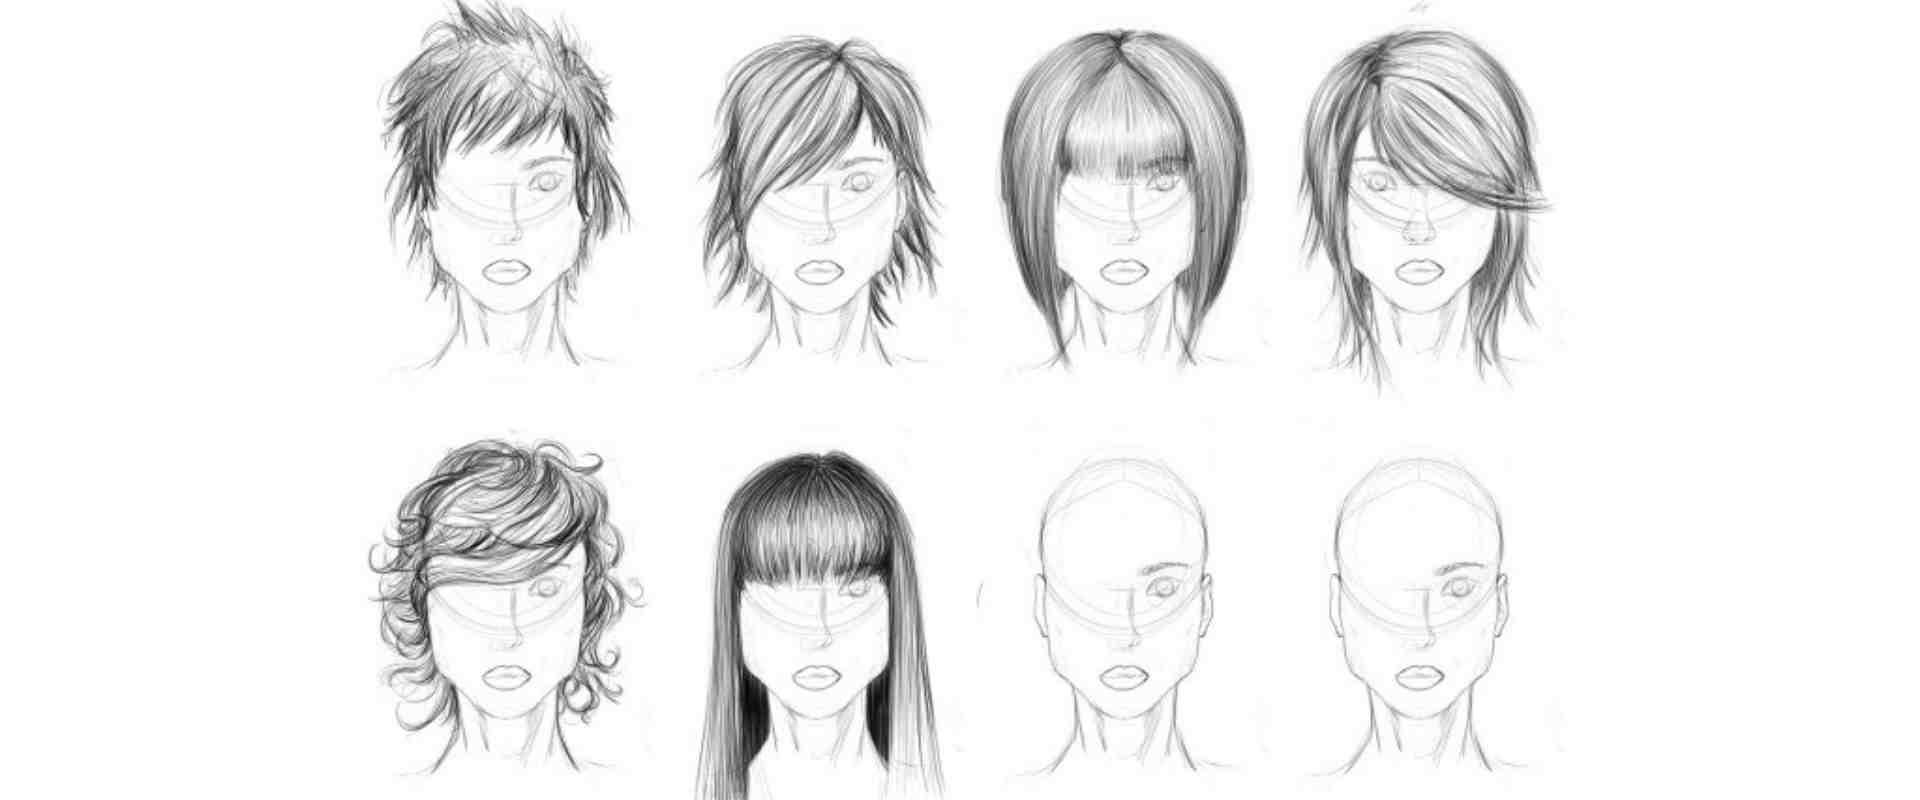 Sketch of a conceptual artist